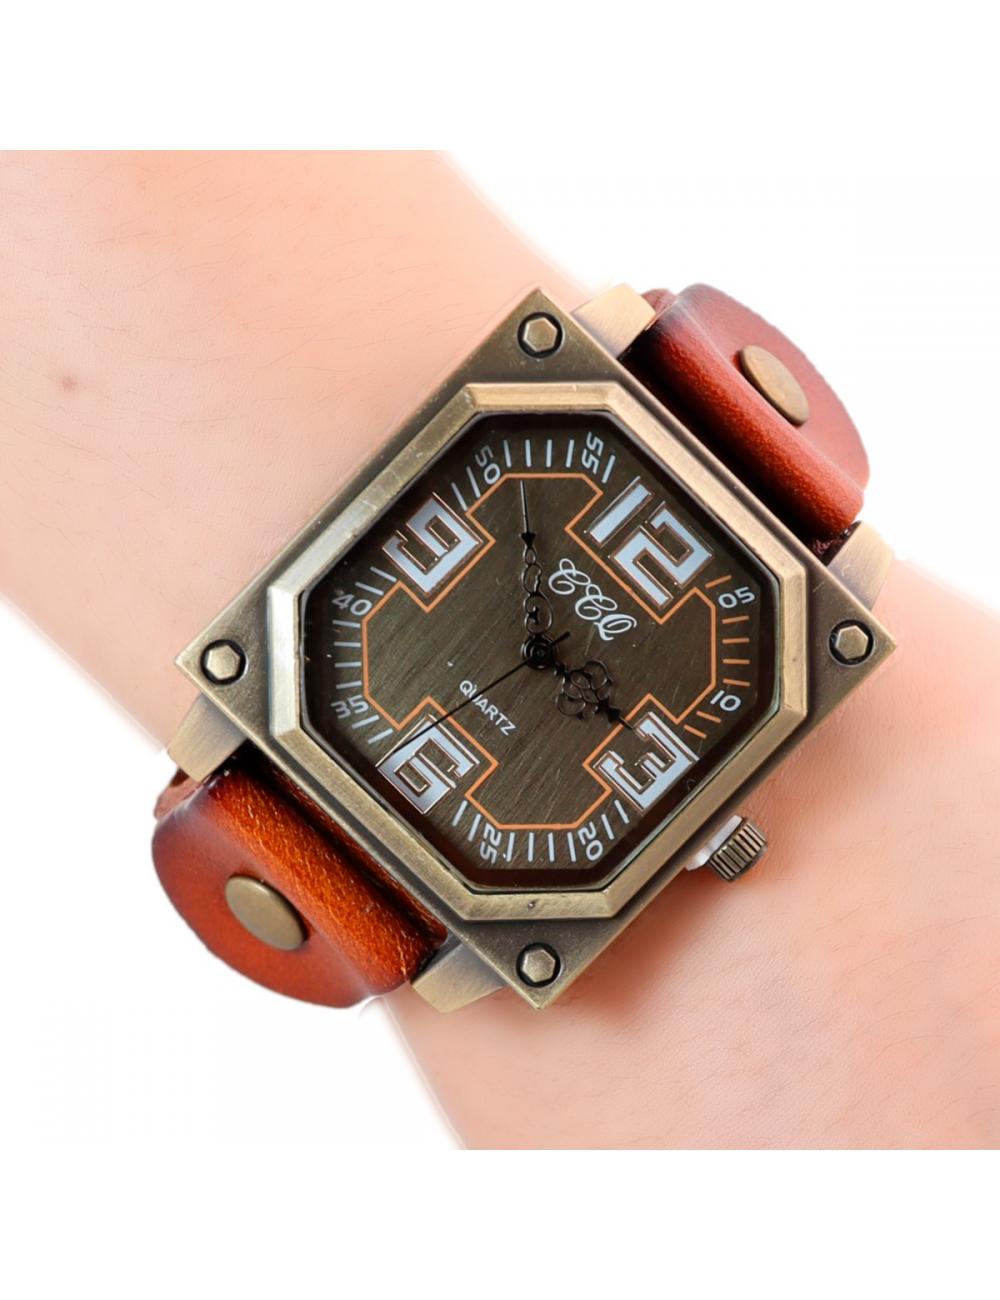 Reloj Cuadrado Dayoshop 49,900.00